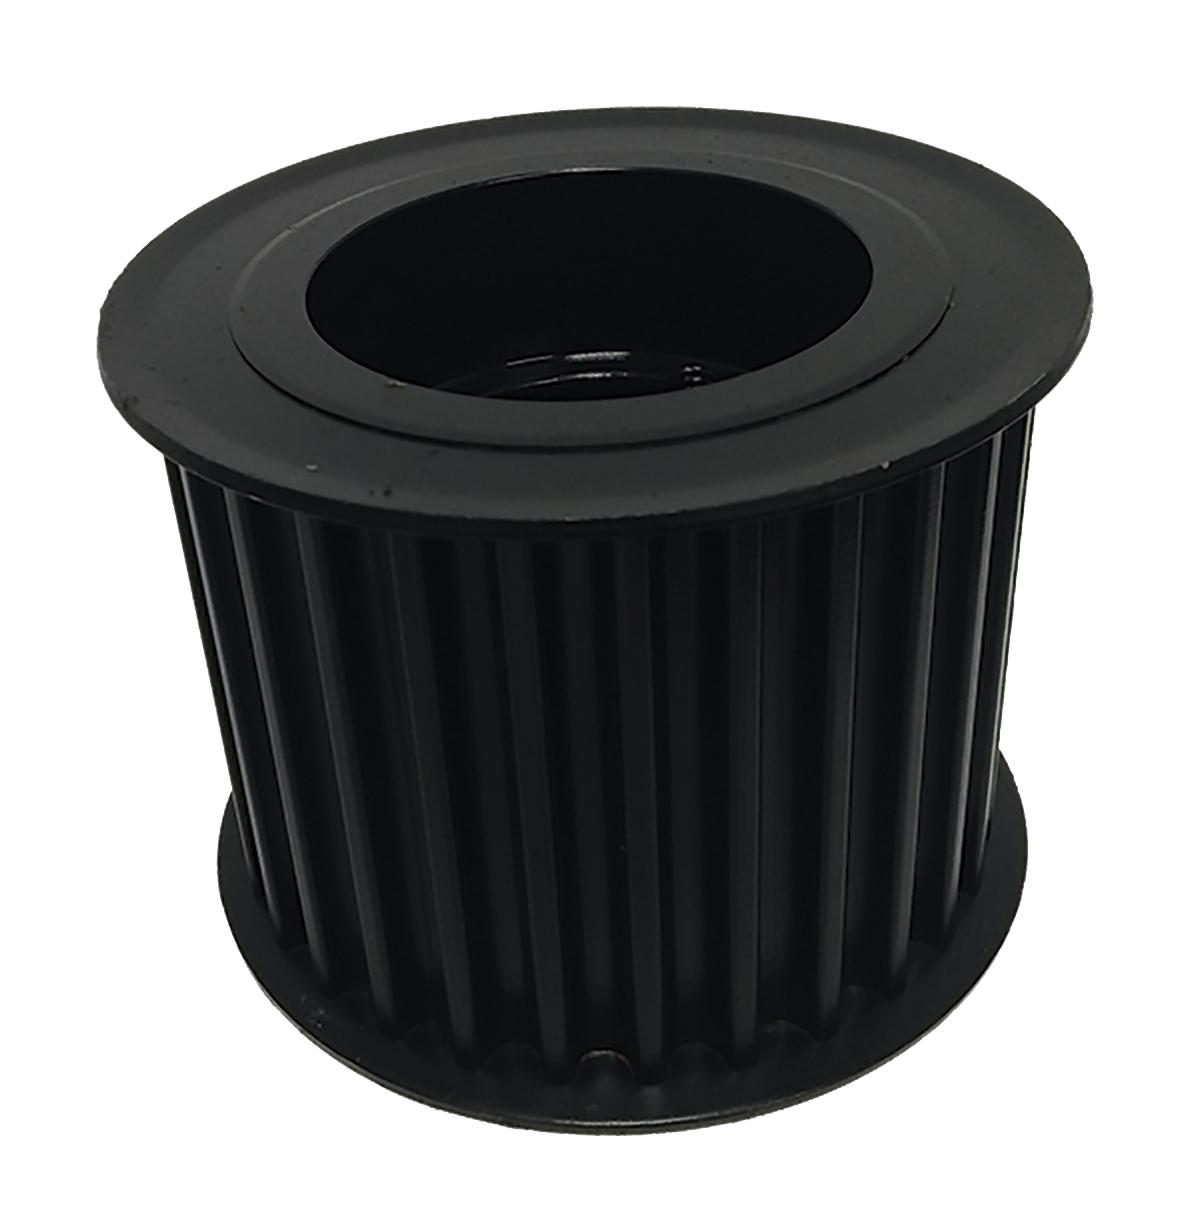 48-14P85-3020 - Cast Iron Powerhouse® Pulleys